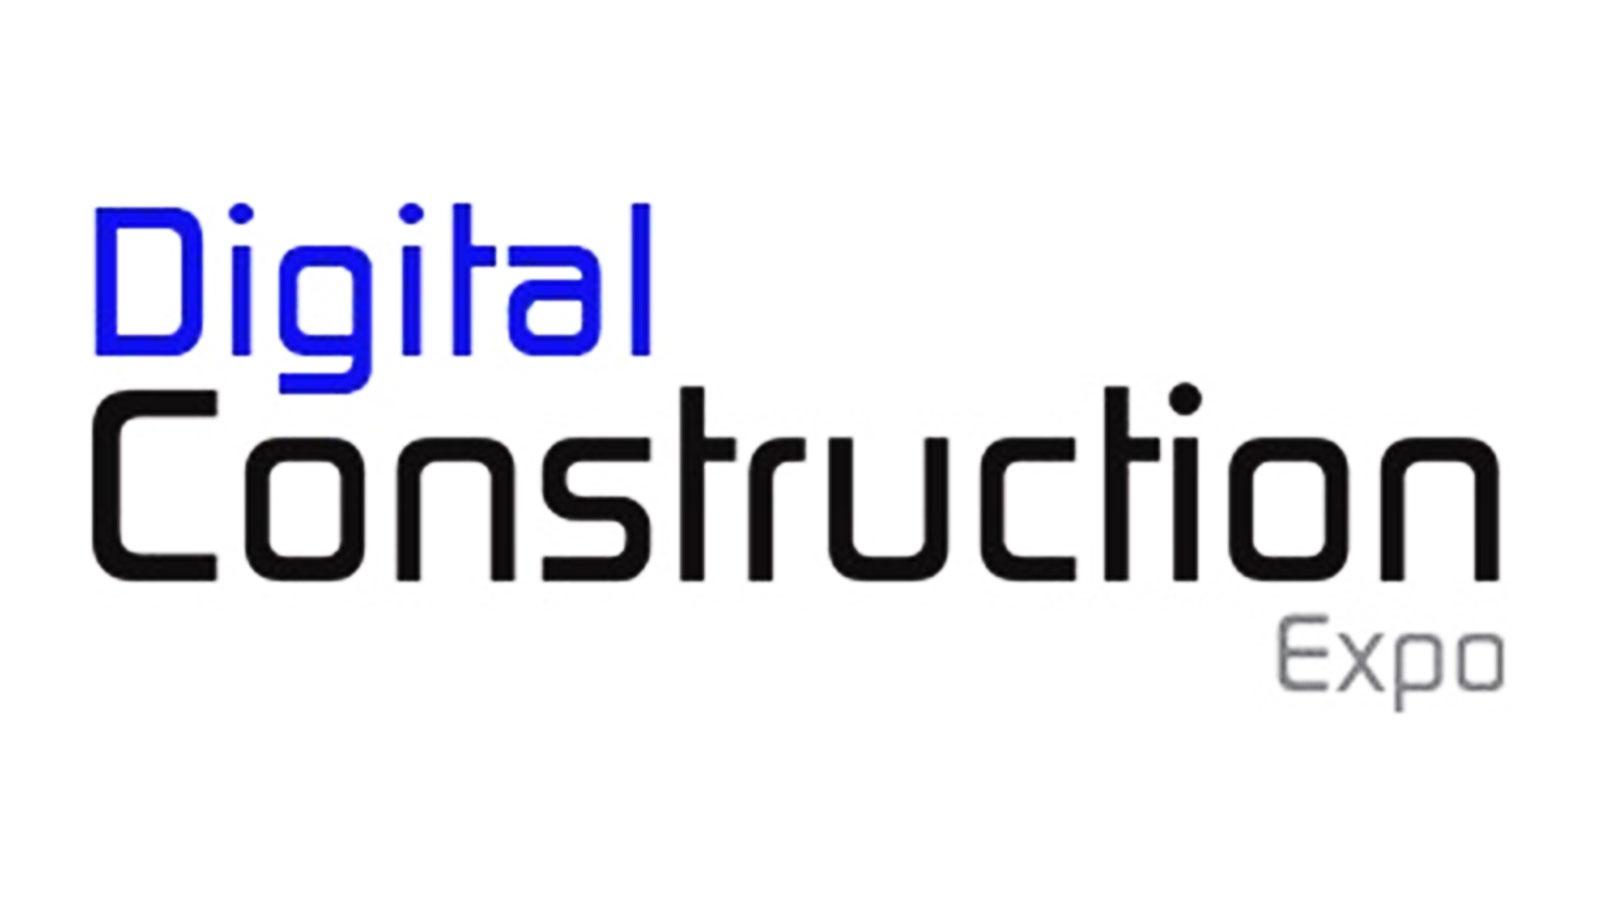 Digital Construction Expo, Johannesburg